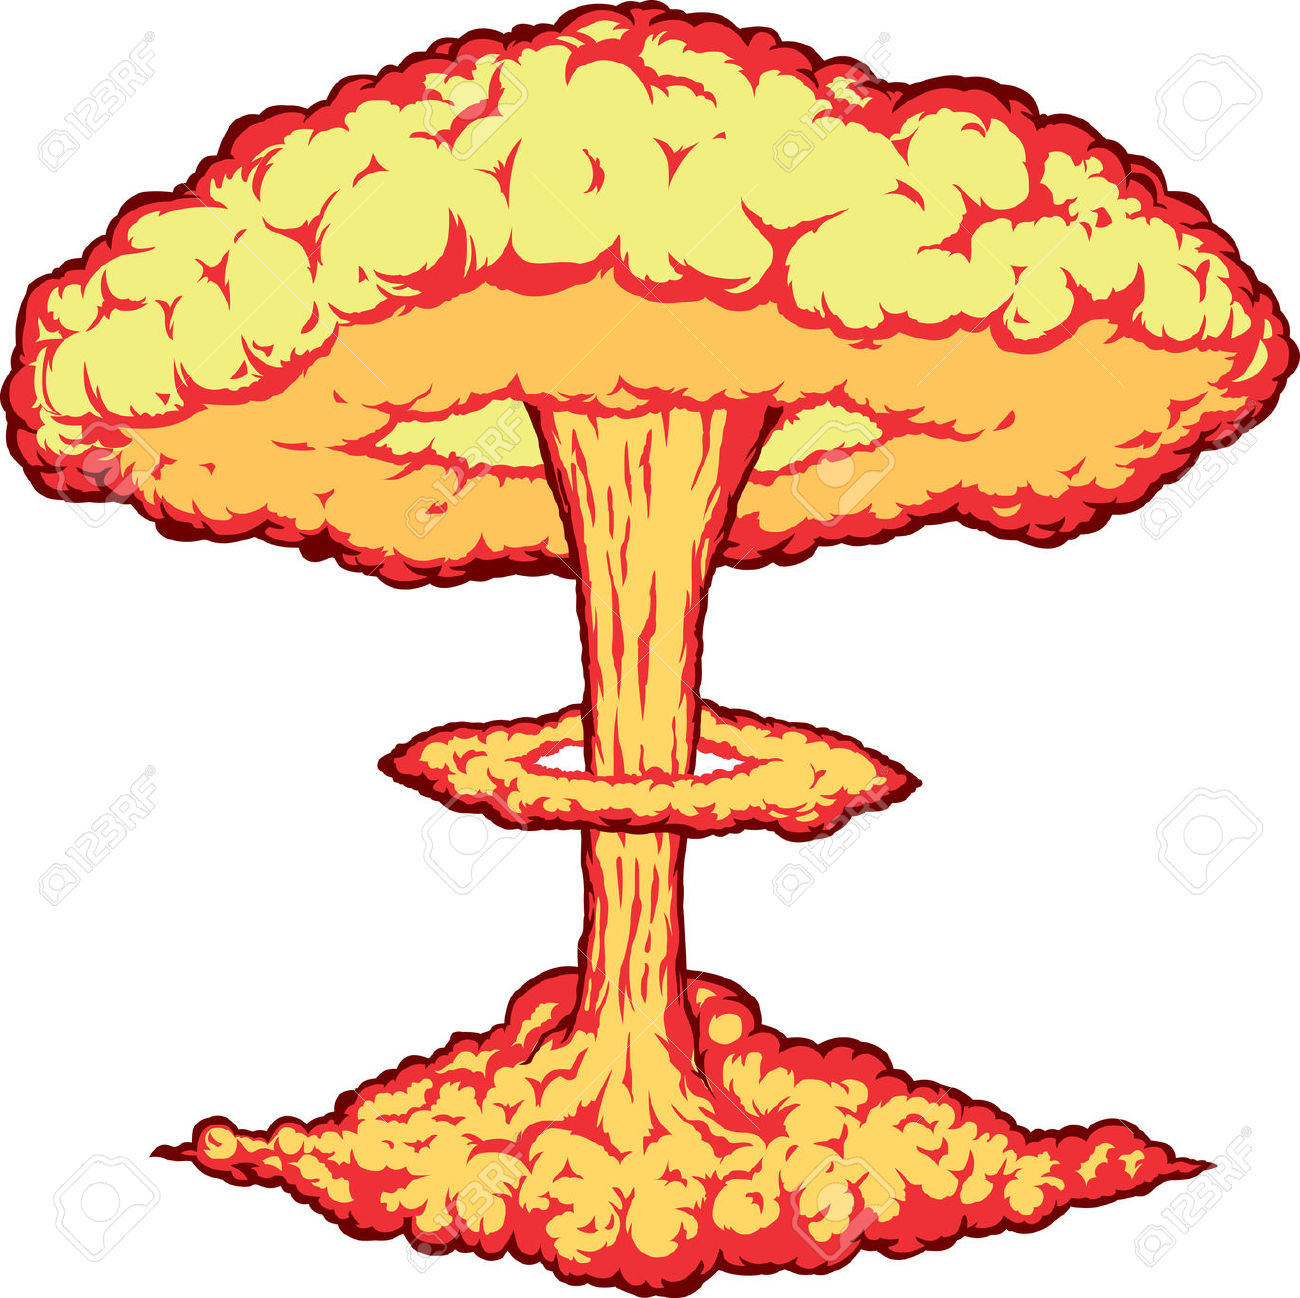 Nuclear Explosion Clipart-Nuclear explosion clipart-18